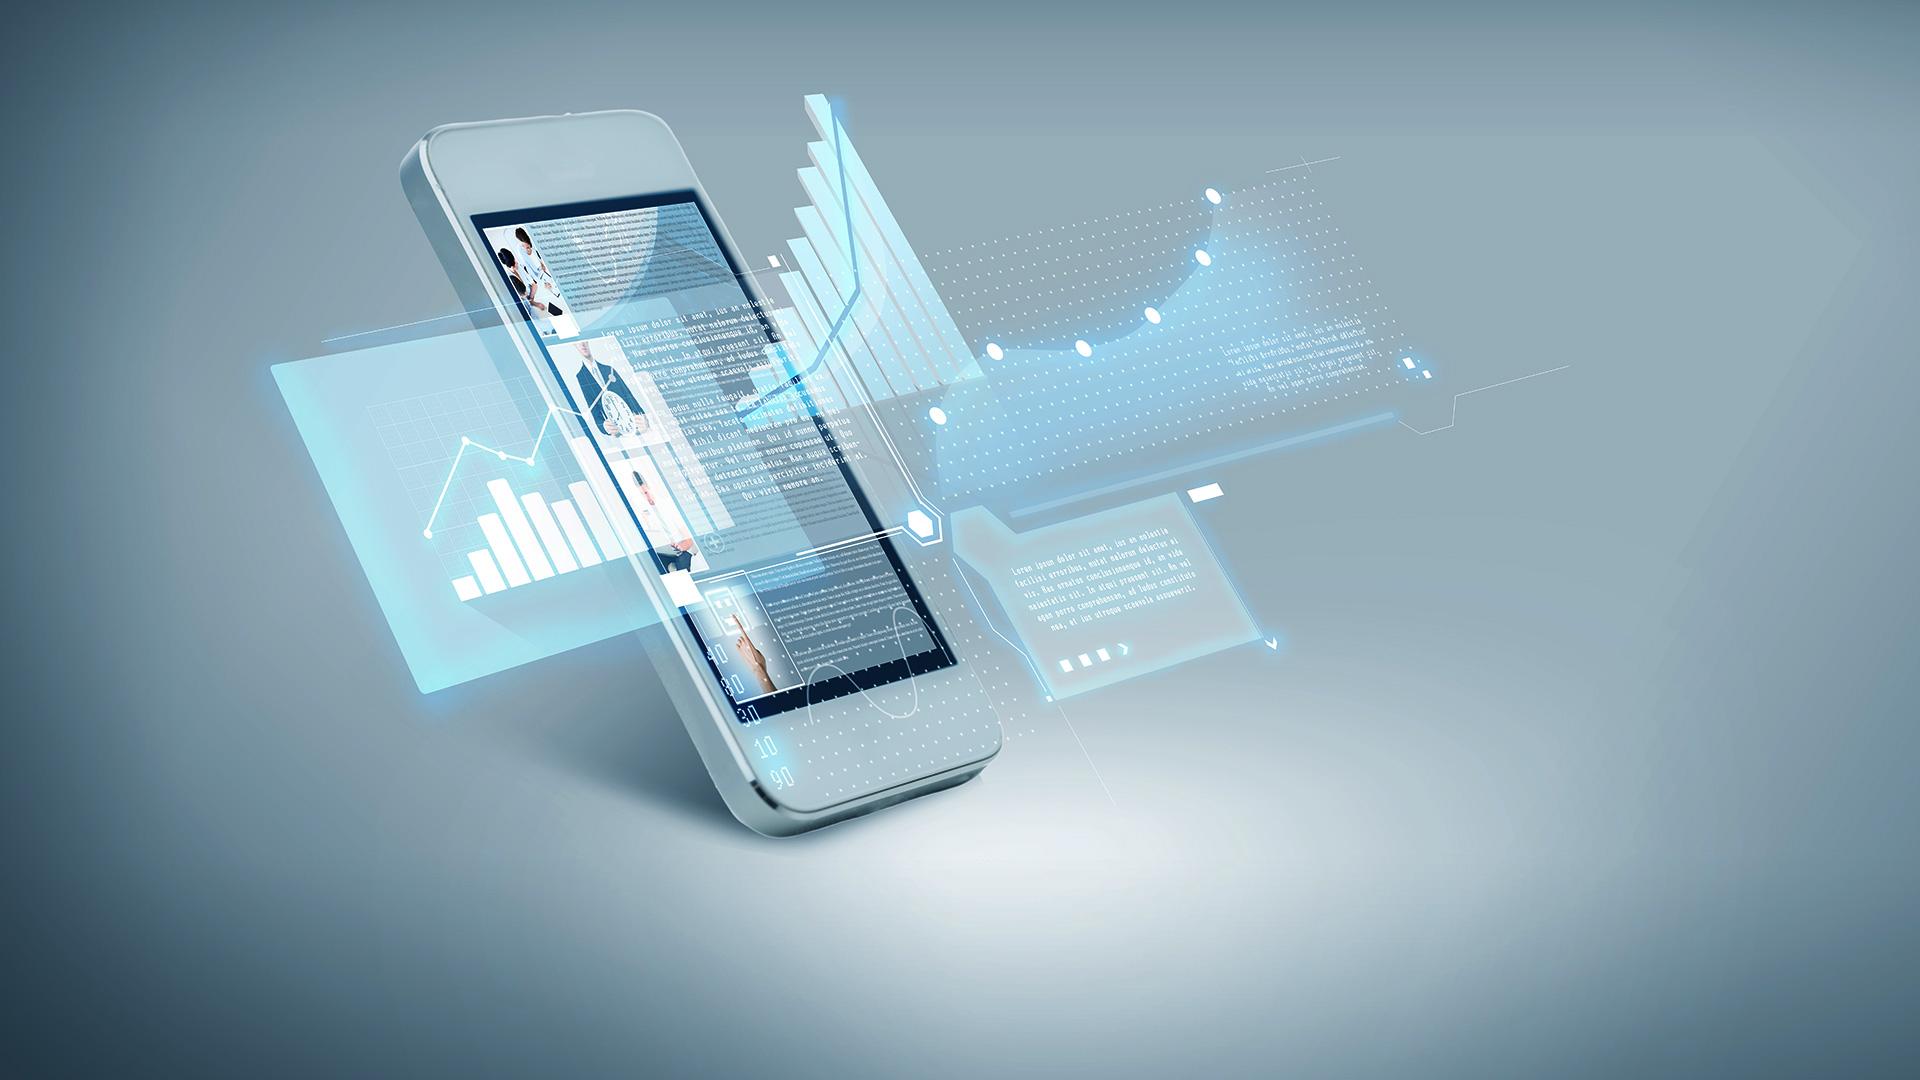 mobile-smartphone-analytics2-ss-1920